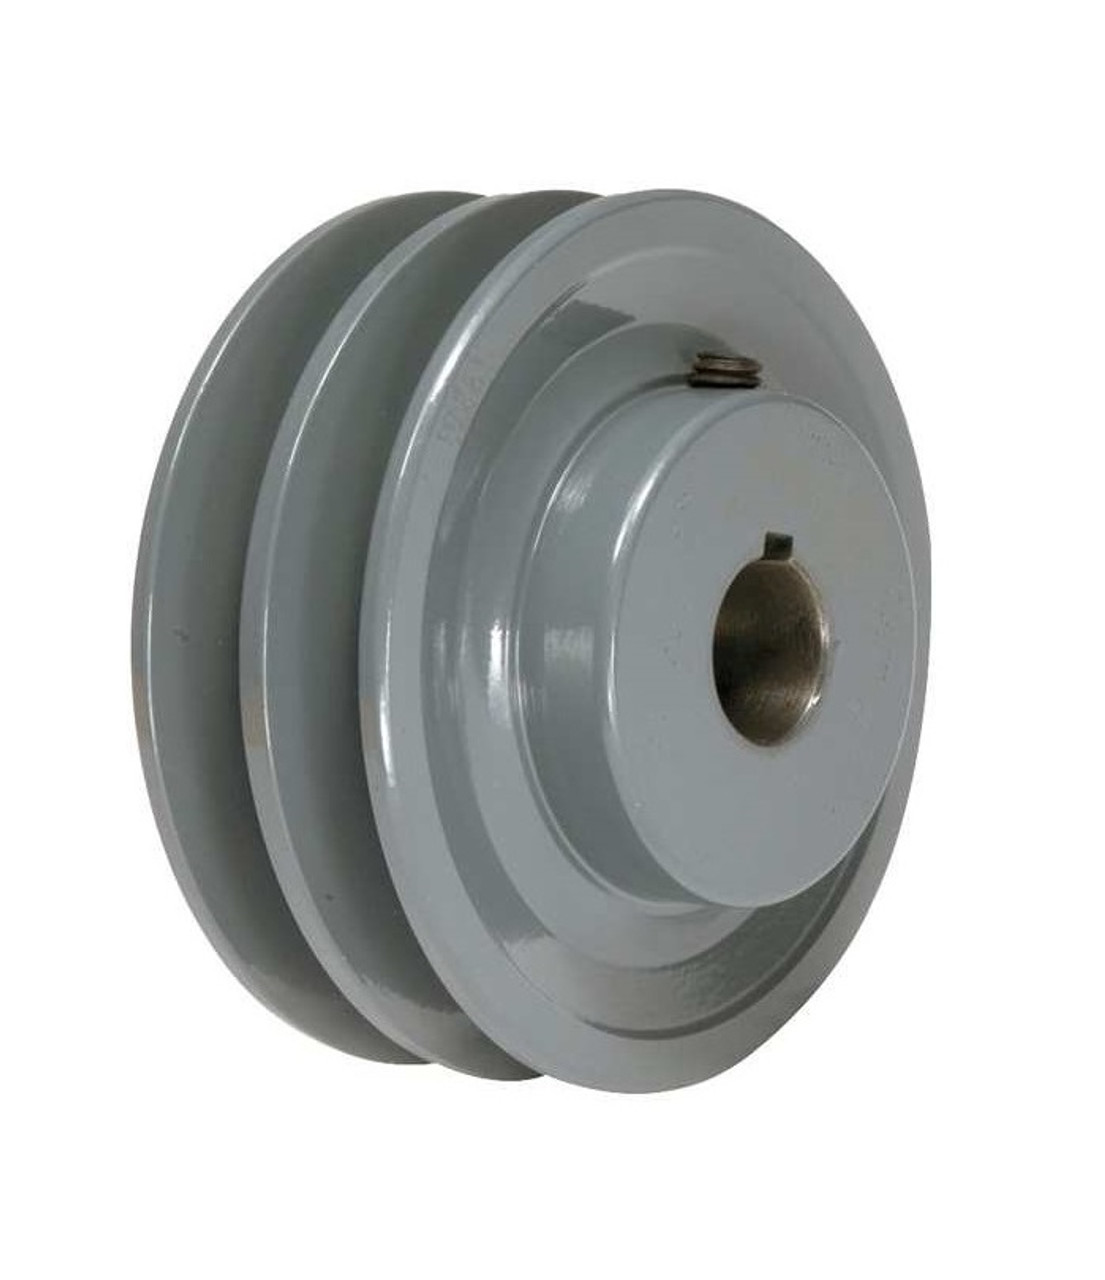 2 Wide 134 Long 2 Wide Jason Industrial 134.0M200 Type 400 Endless Woven Flat Belt Polyester 134 Long